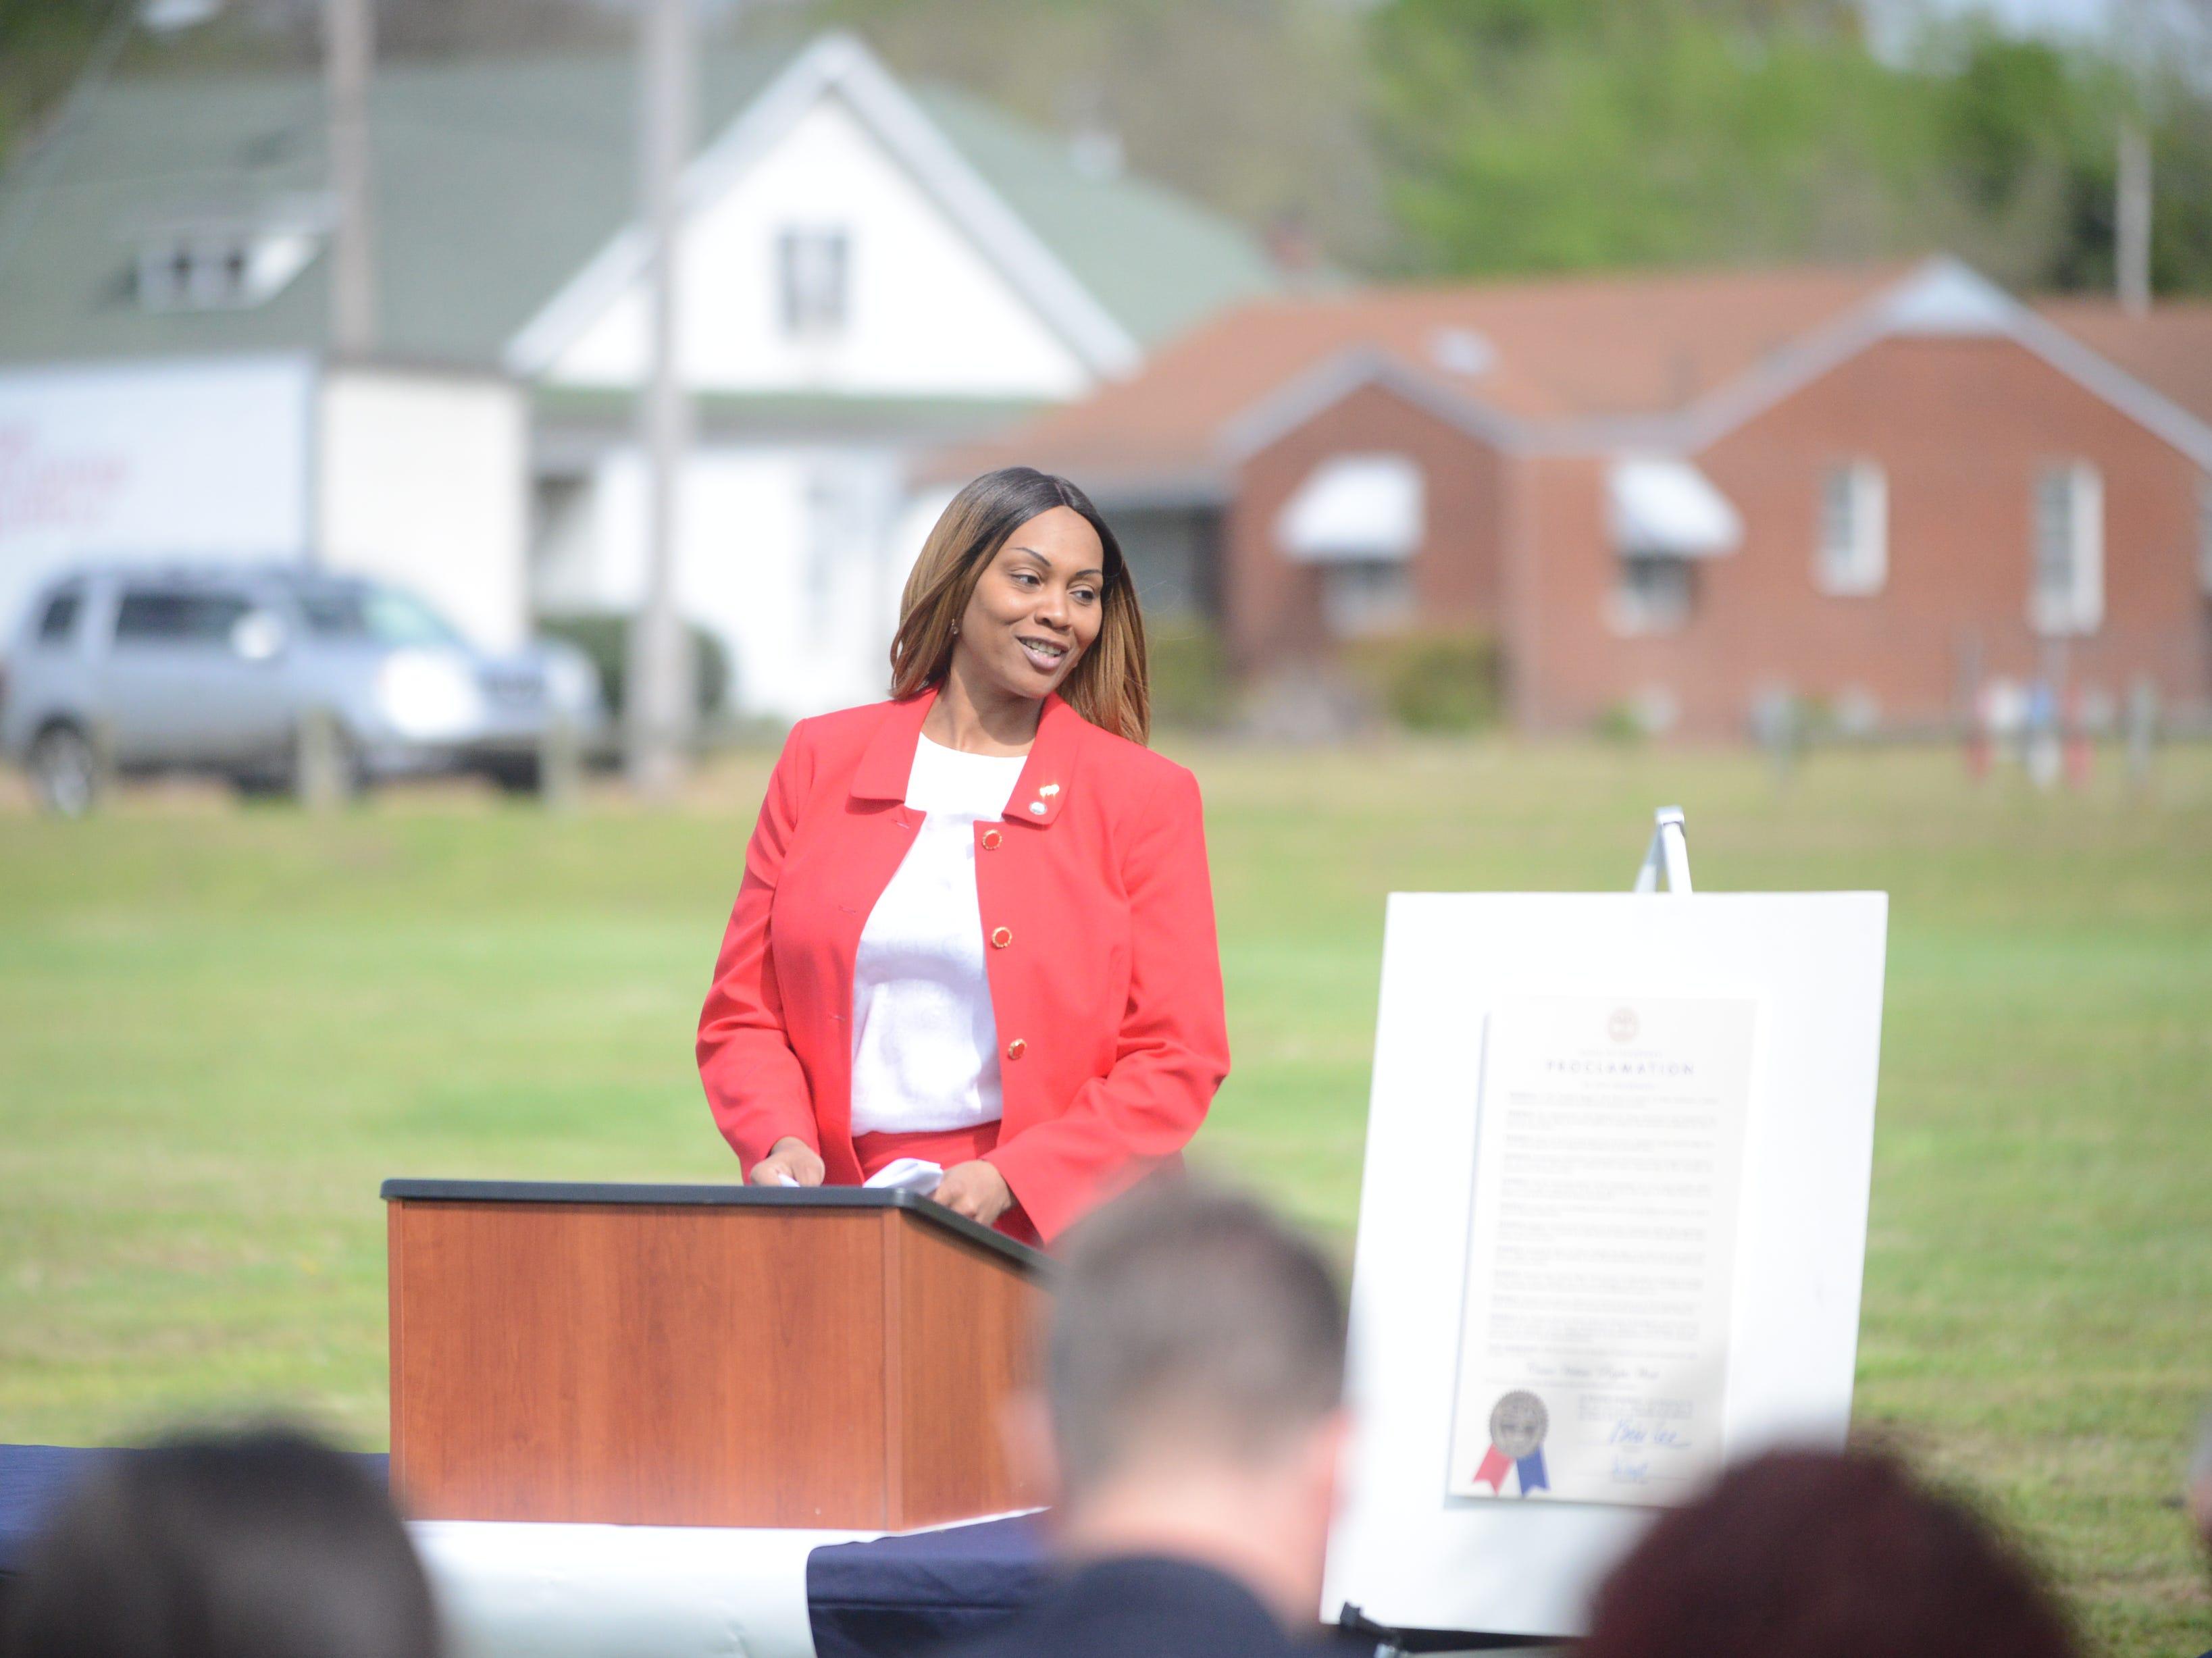 District 60 Manager Monika Jones introduces keynote speaker Maryetta Rudd.